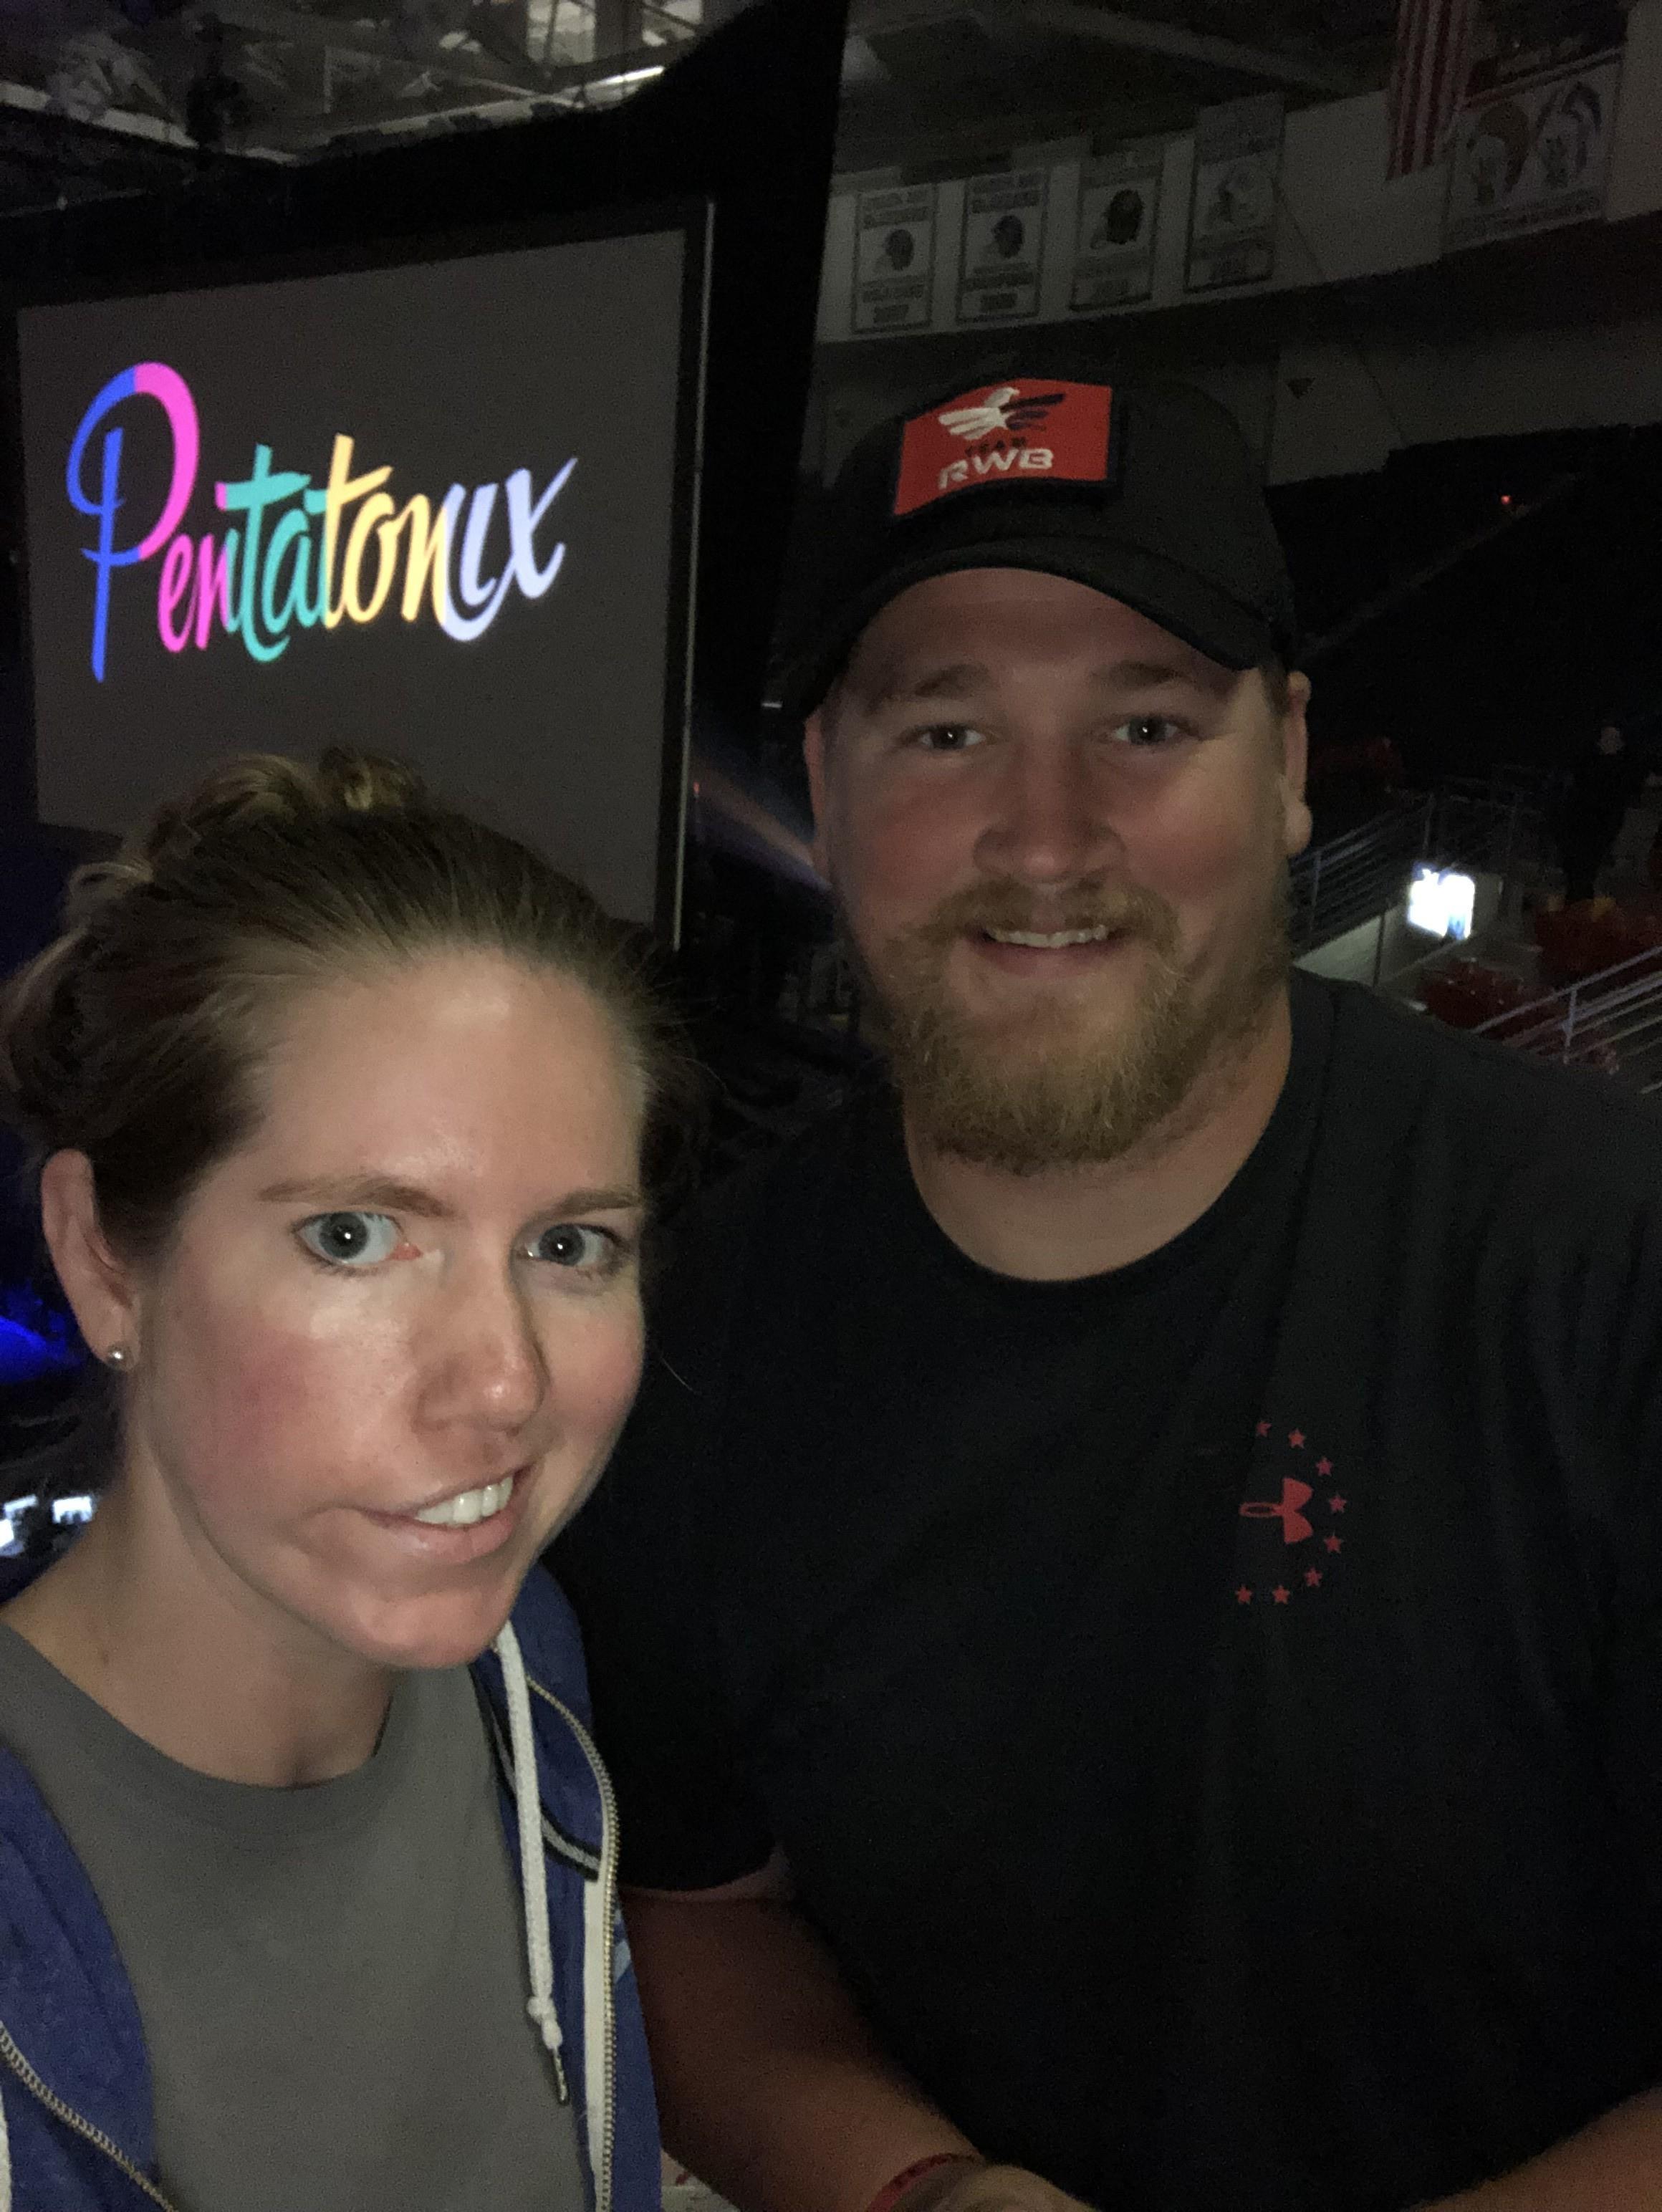 Rachel Platten Tour 2020 Thank You Messages To Veteran Tickets Foundation Donors